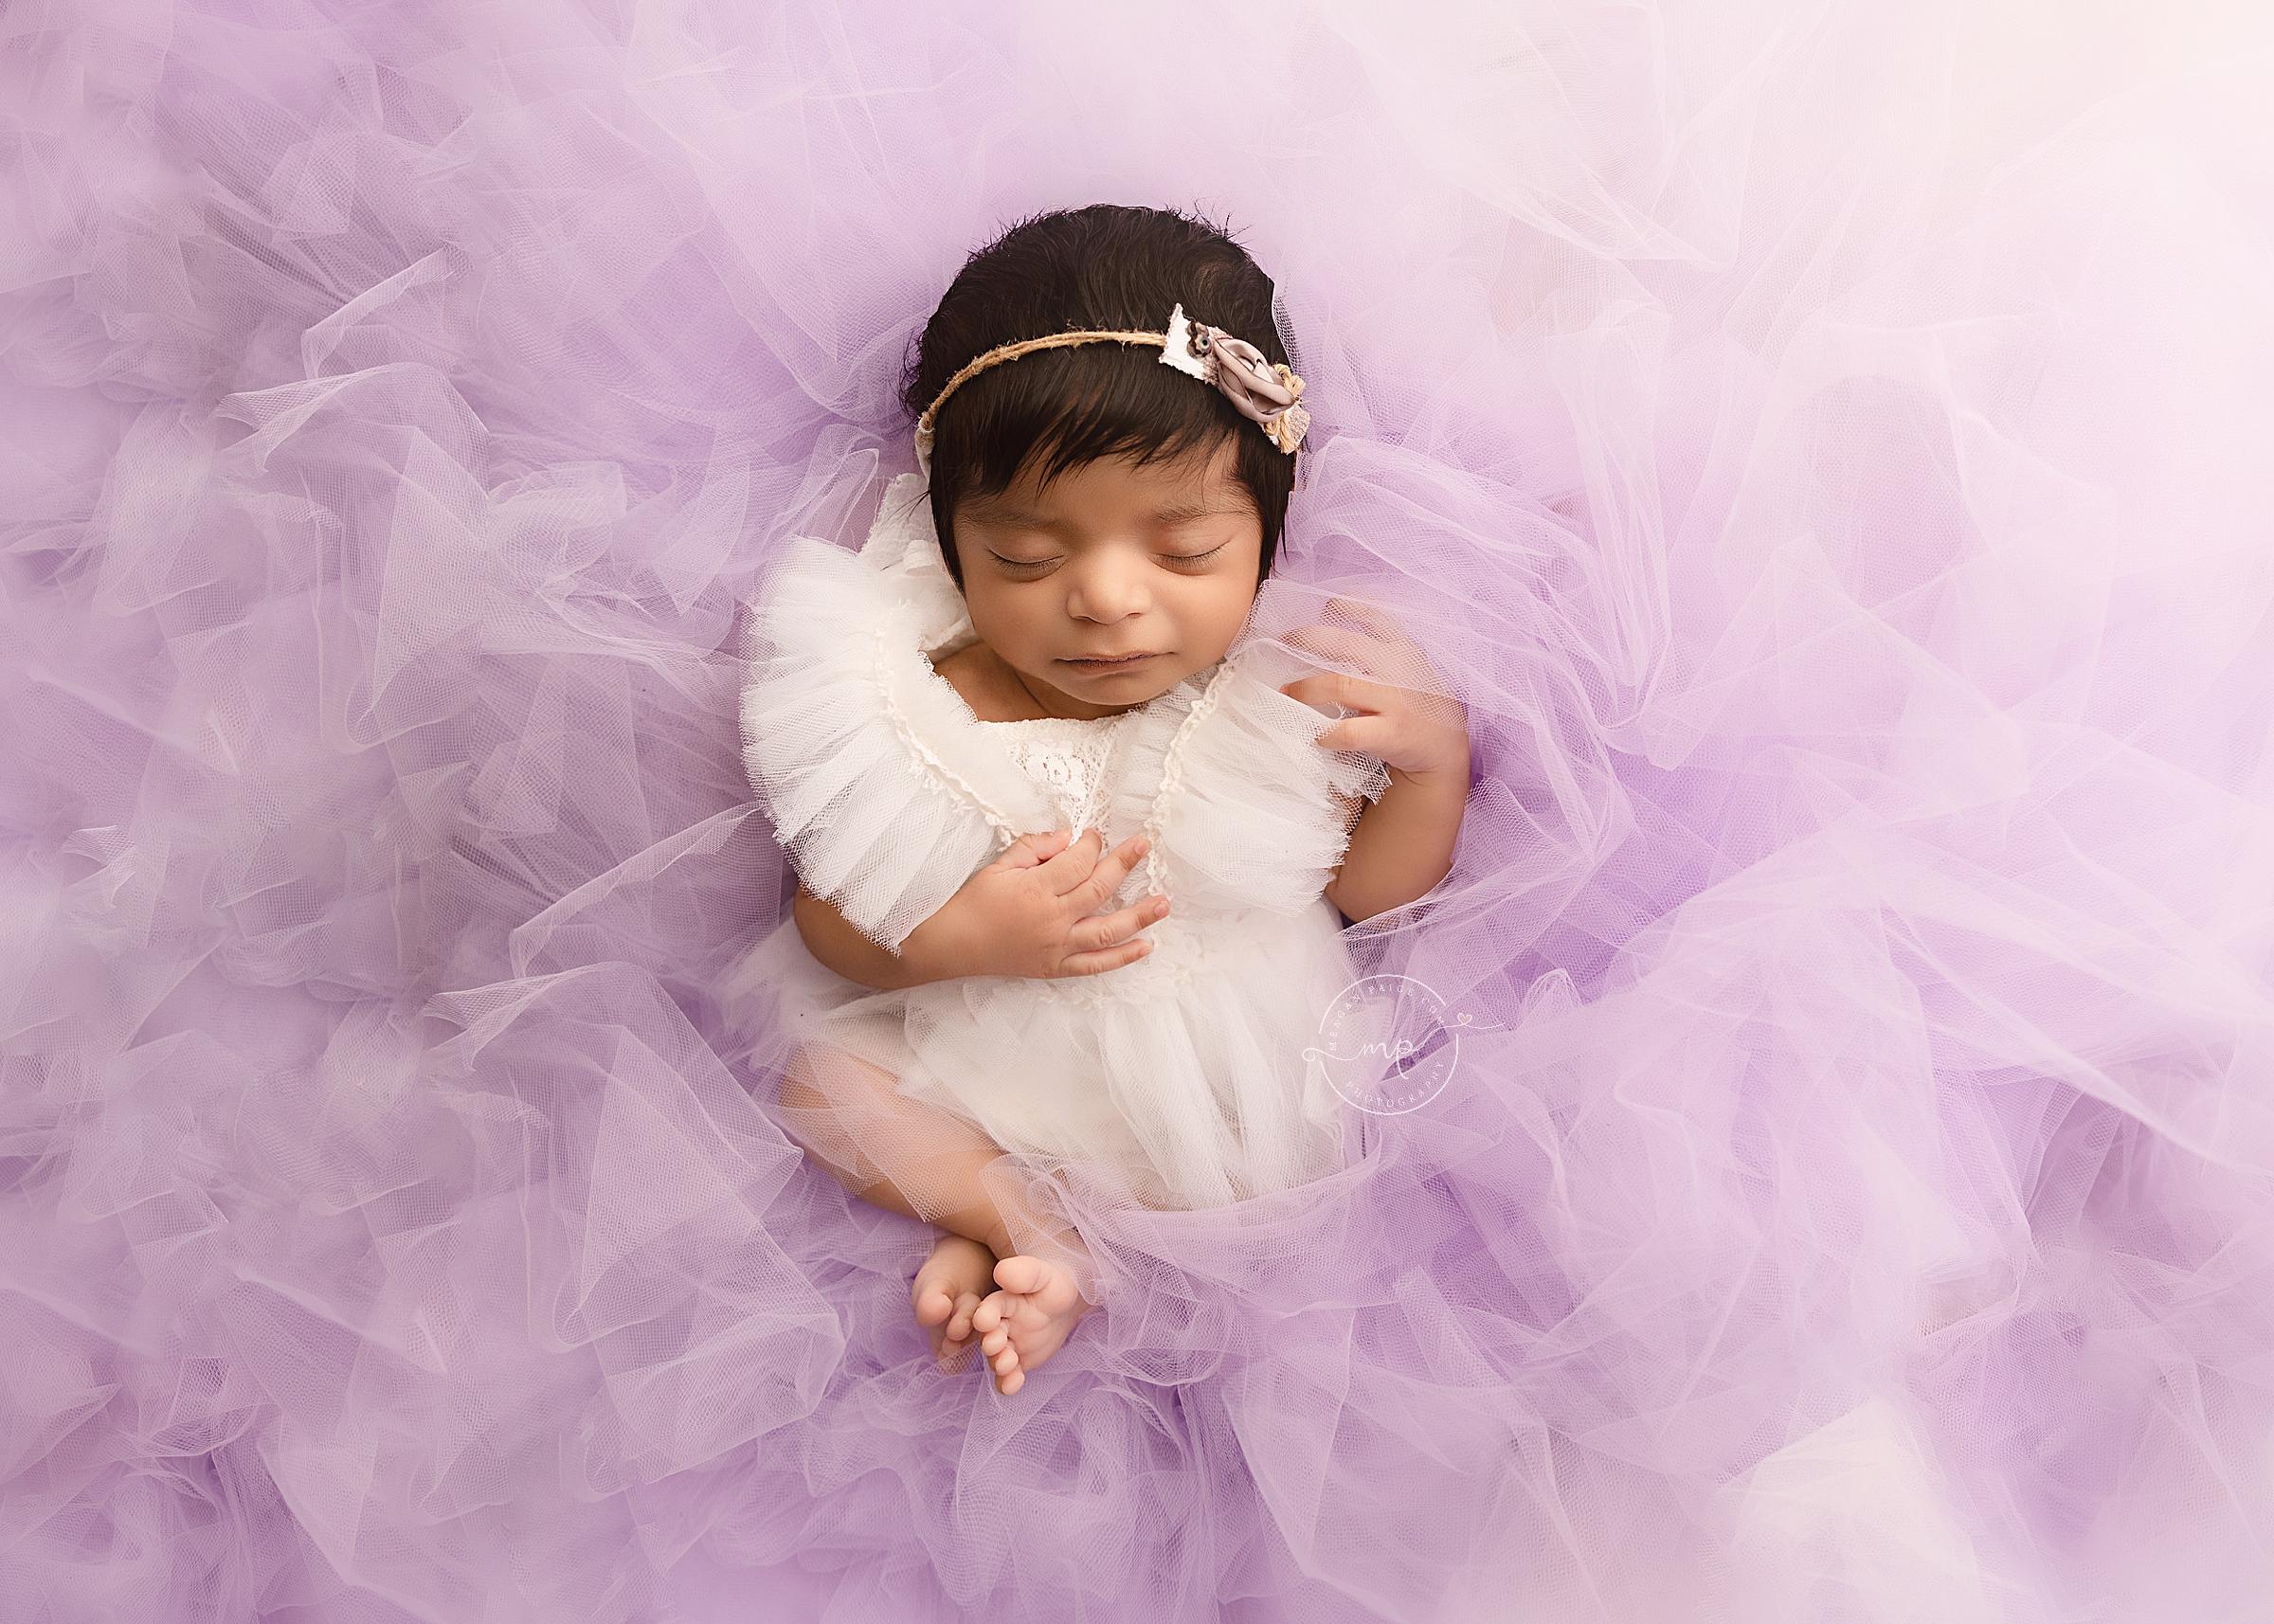 NW Calgary Newborn Girl Photographer - Meagan Paige Photography